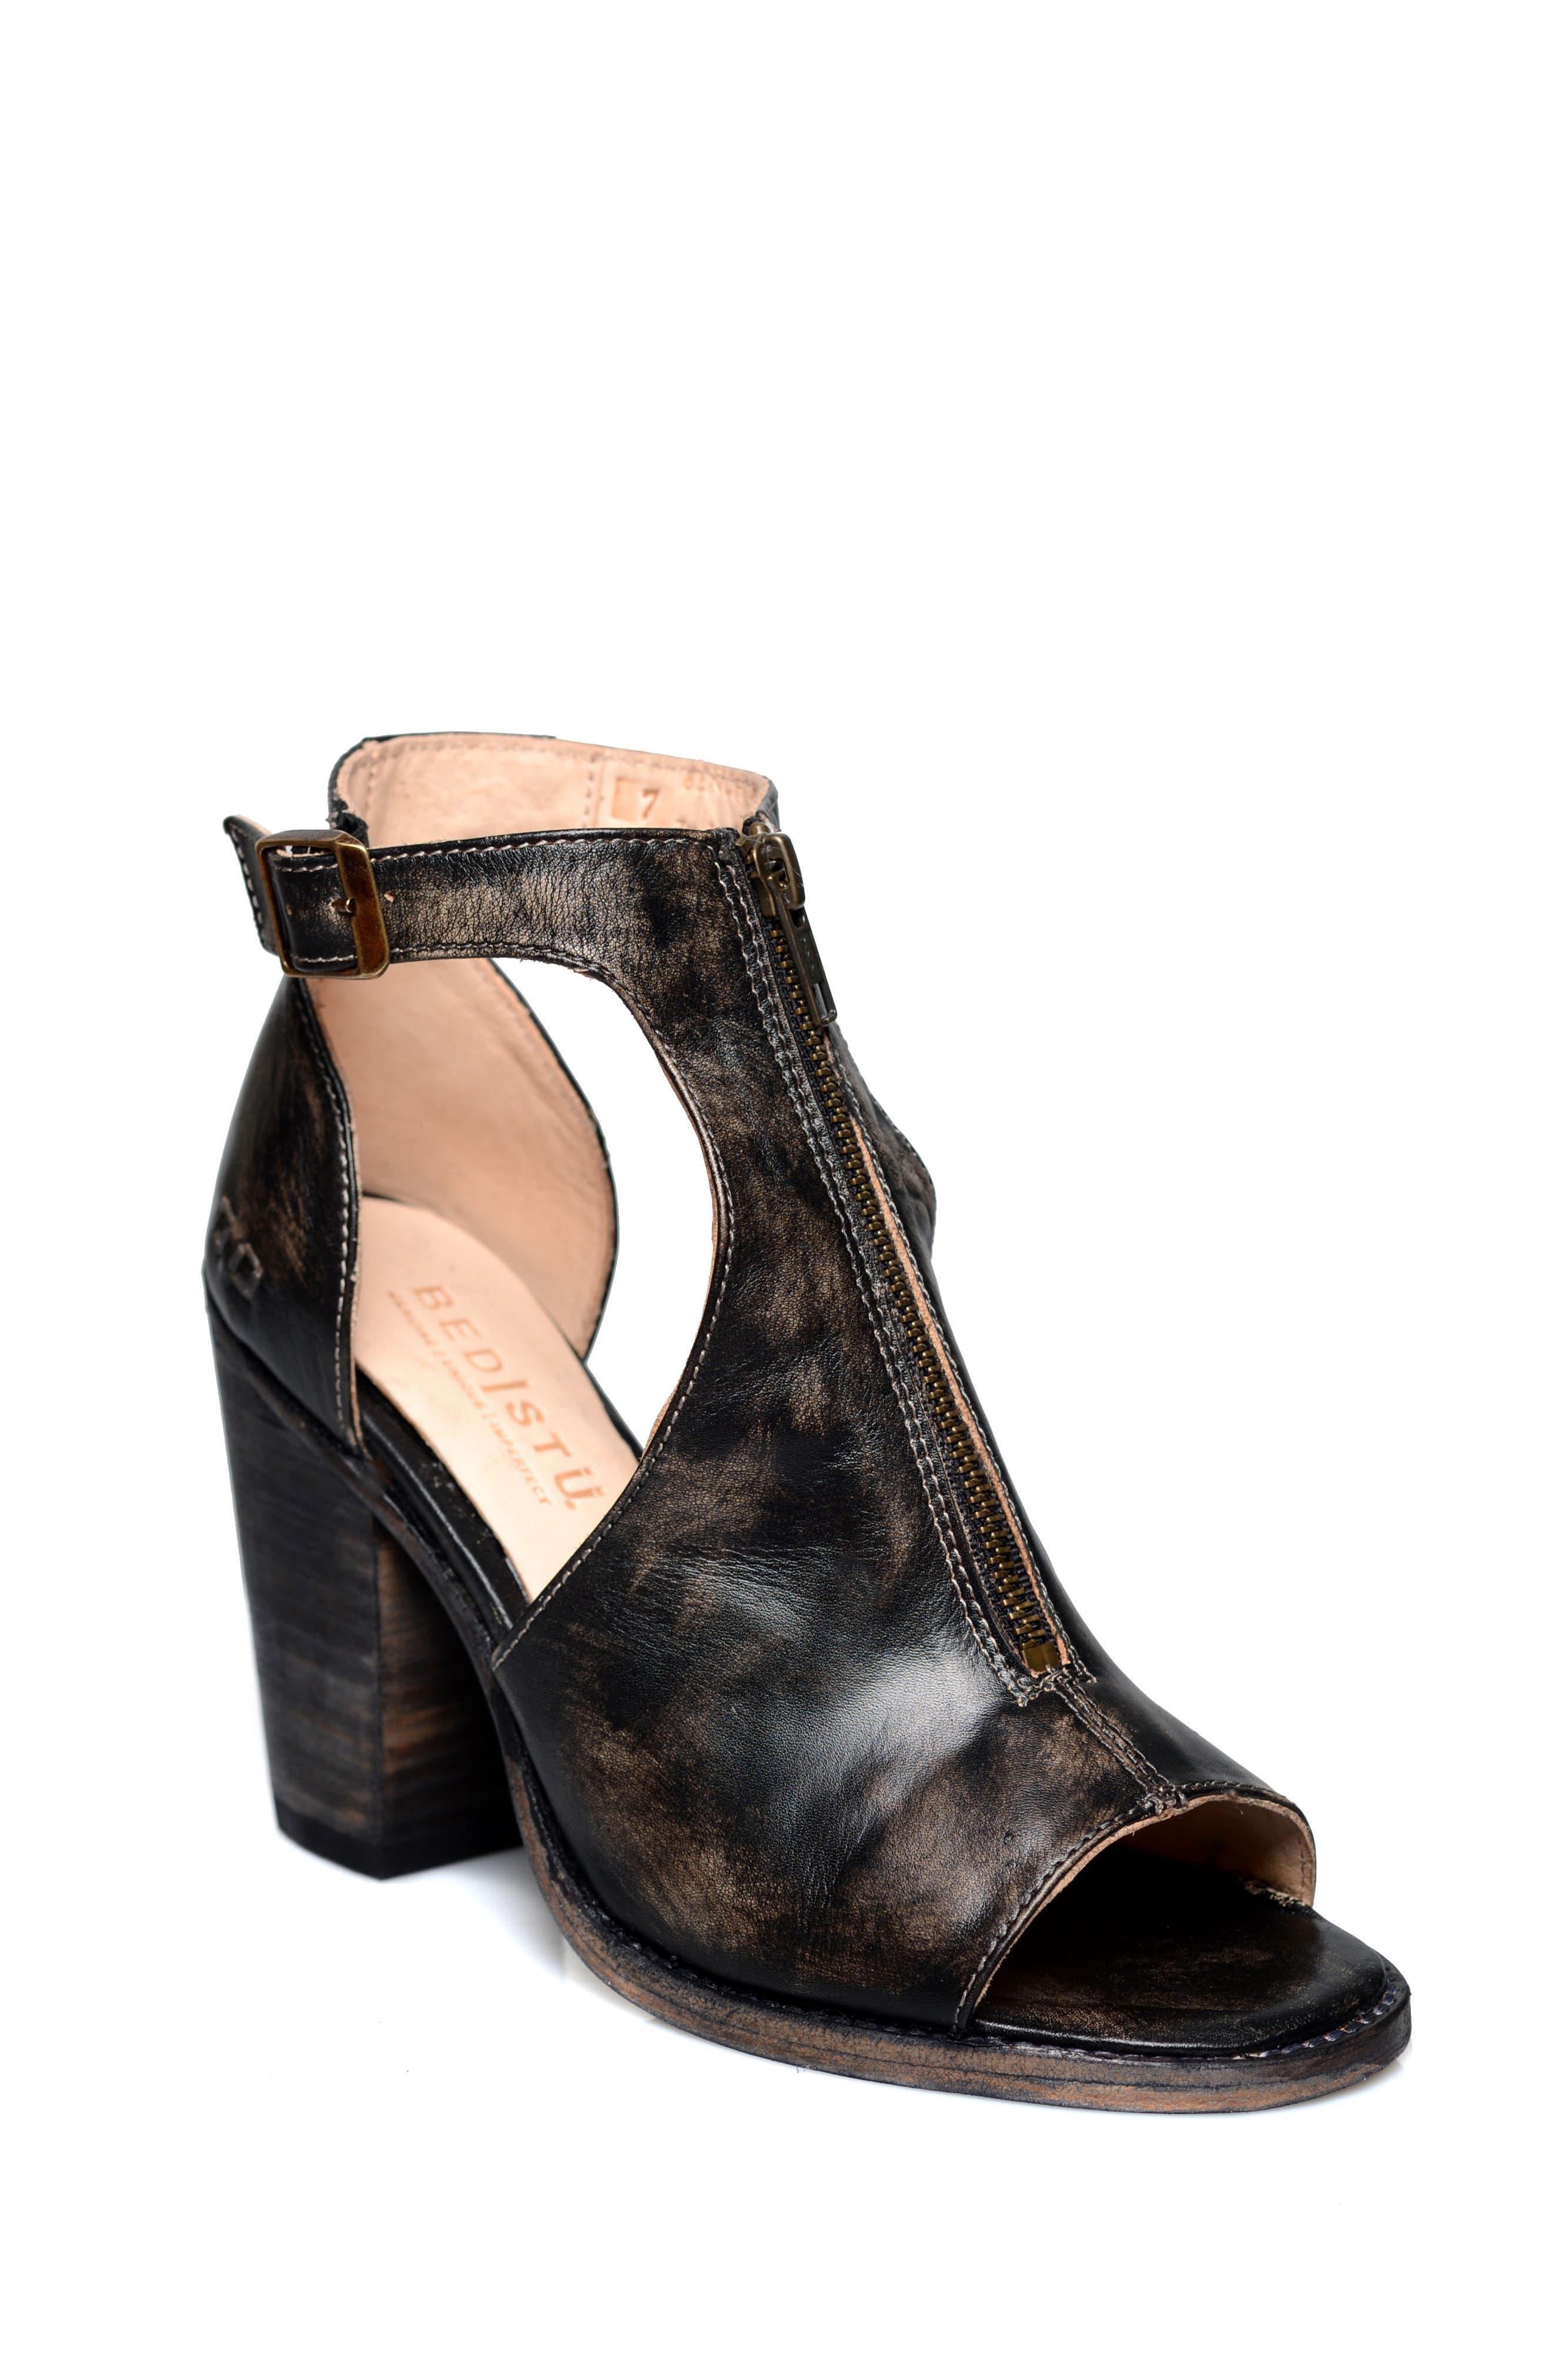 Olena Open Toe Bootie,                         Main,                         color, Black Leather